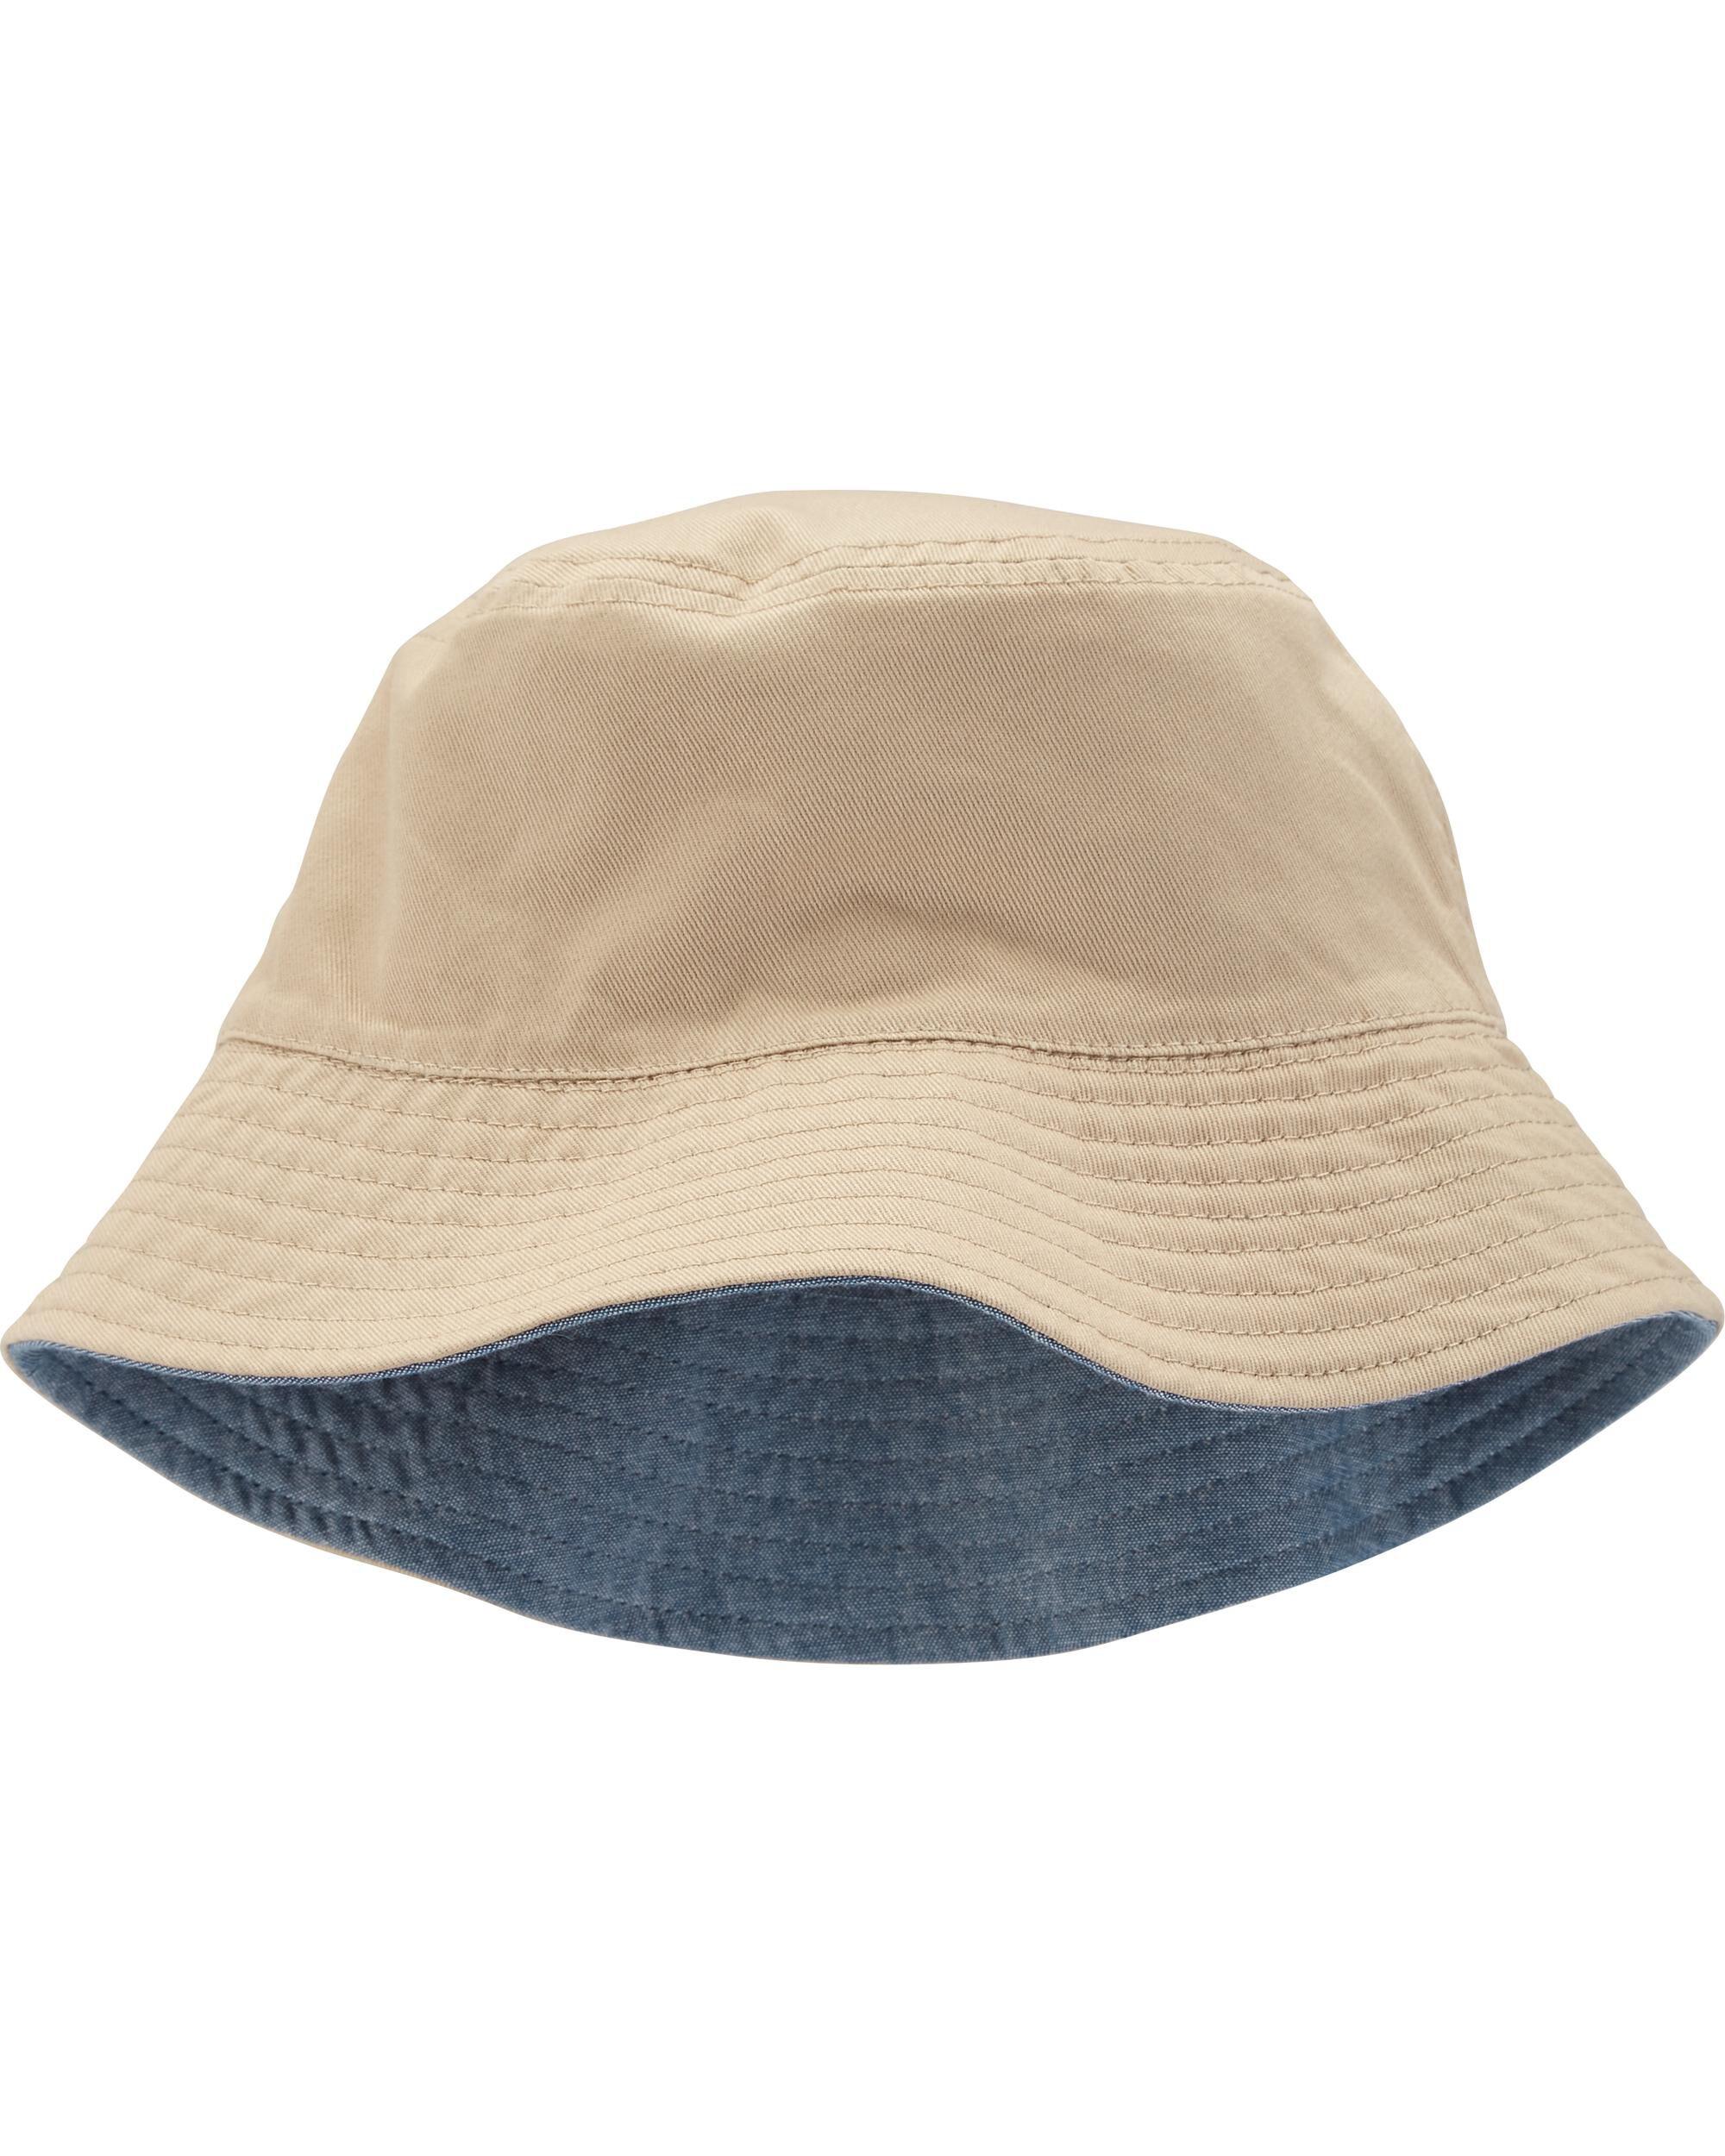 e8751230f6acb Reversible Bucket Hat  Reversible Bucket Hat